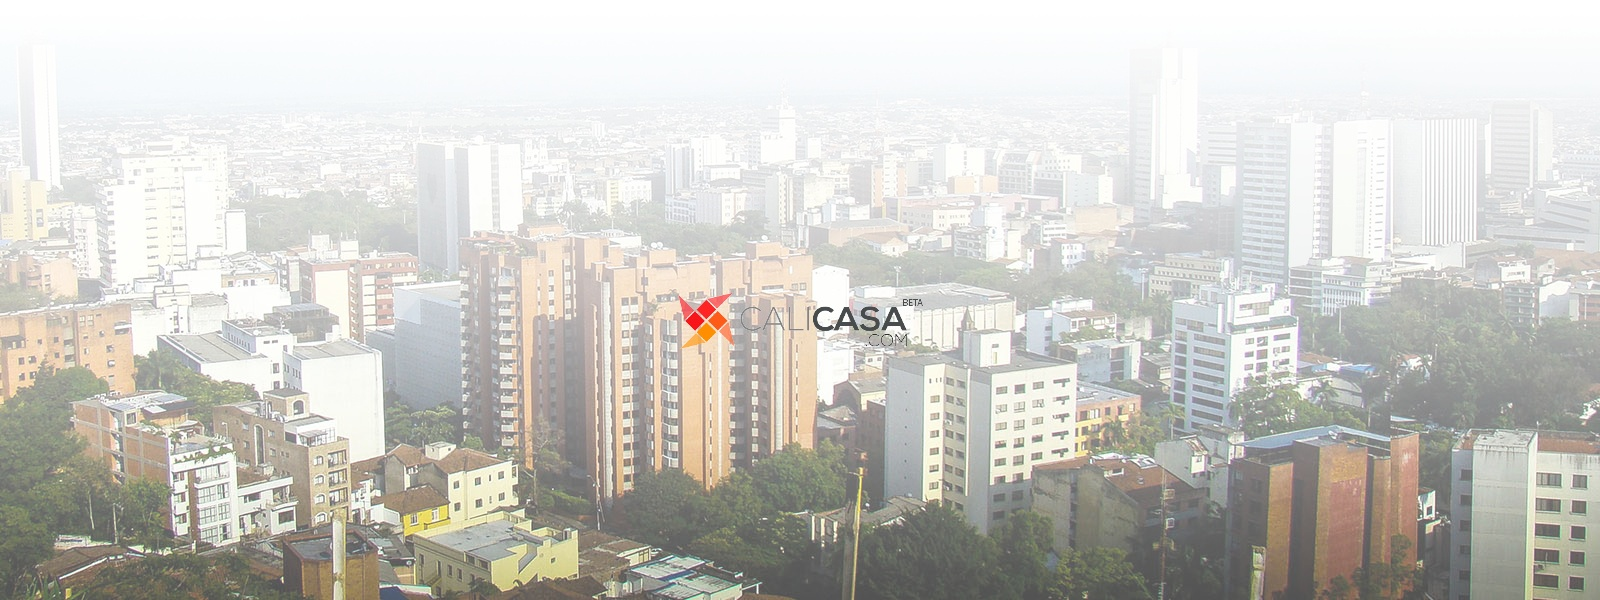 Calicasa image